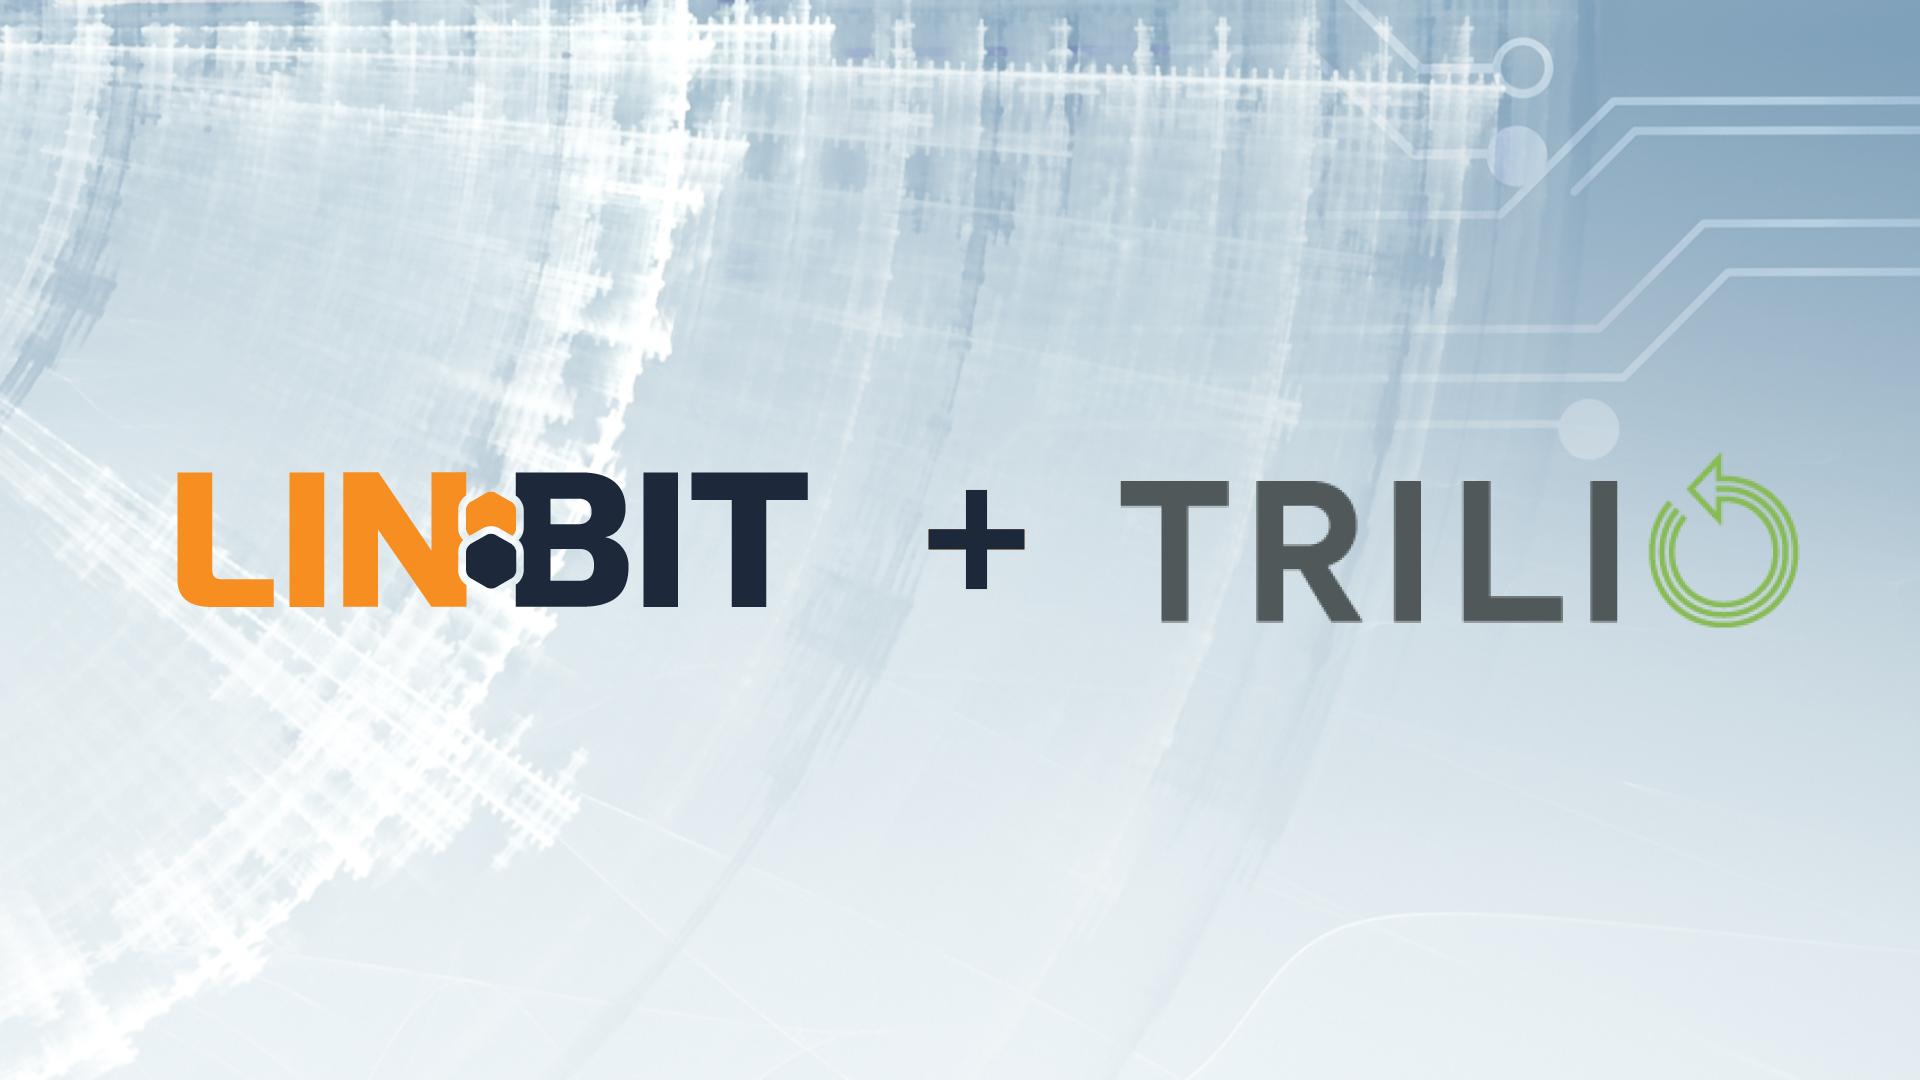 LINBIT Trilio Partnership LINSTOR Kubernetes